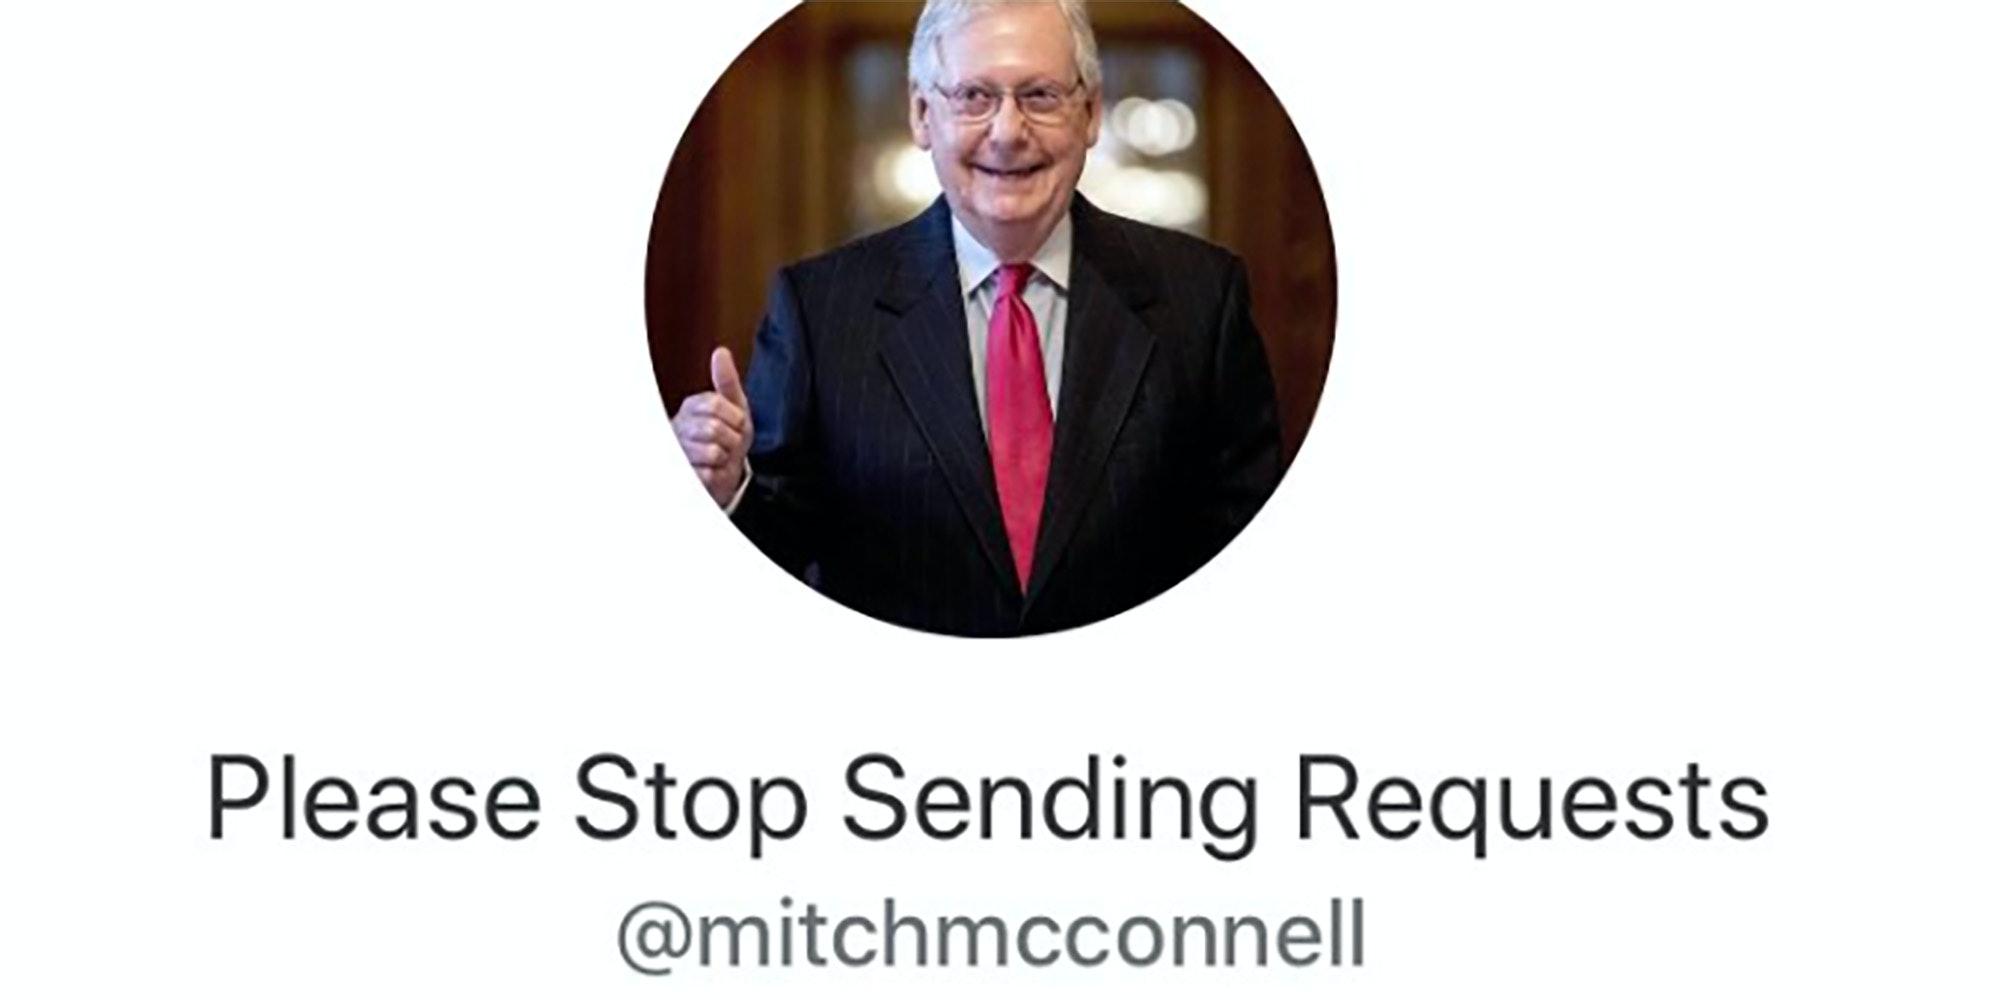 mitch mcconnell stimulus check request paypal venmo